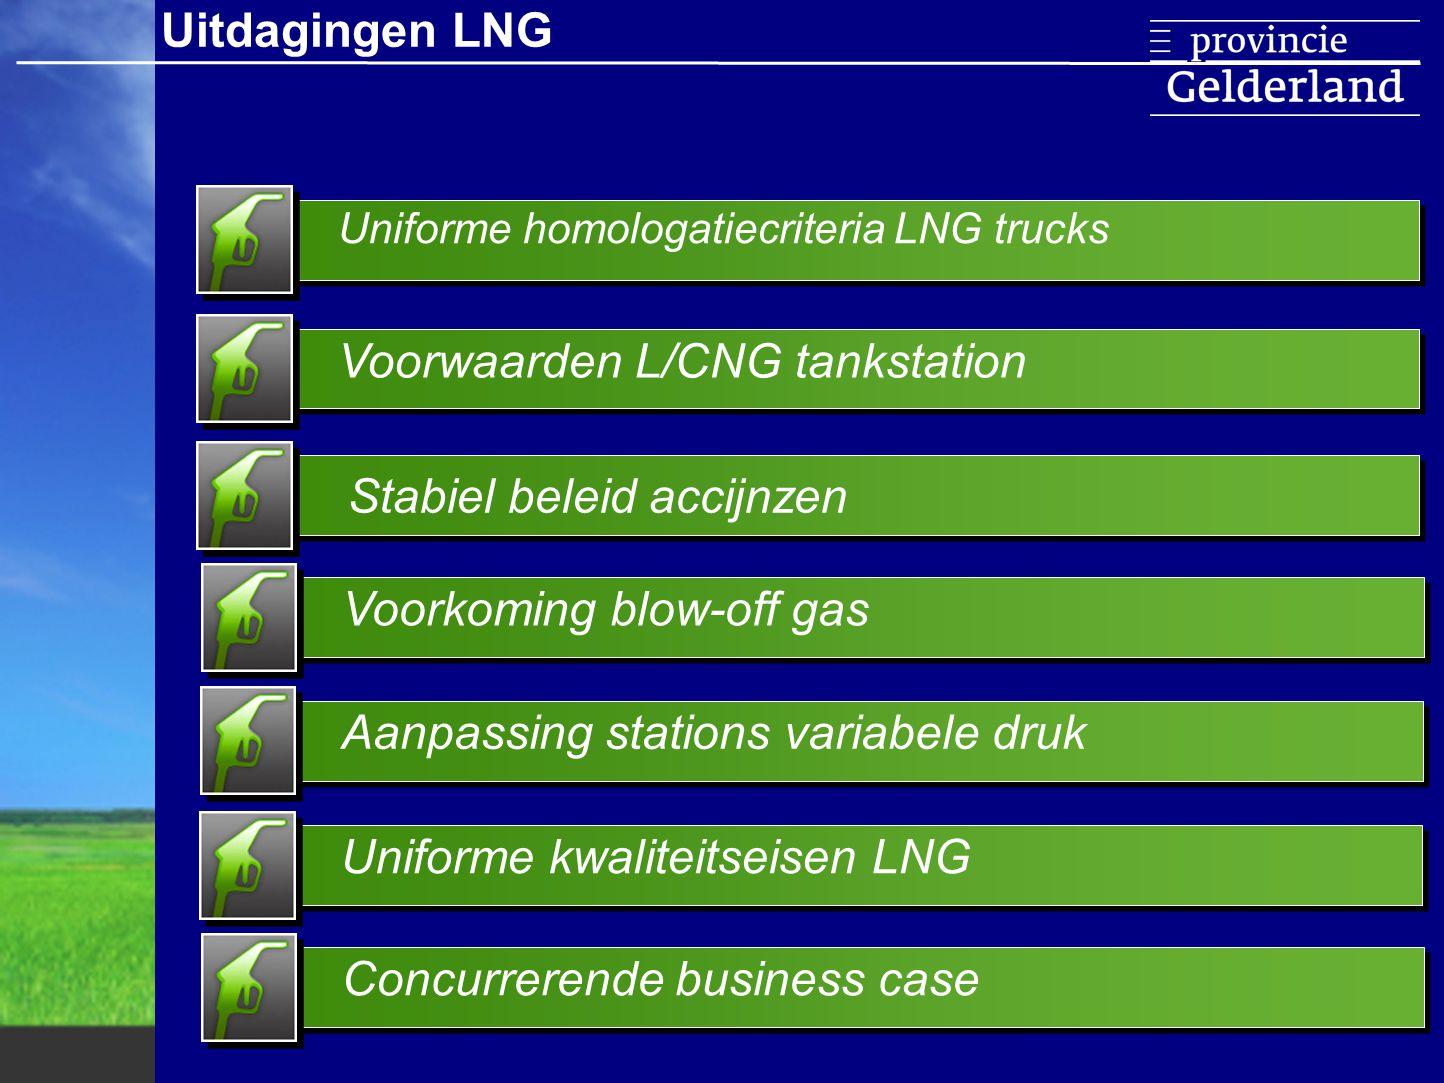 Voorwaarden L/CNG tankstation